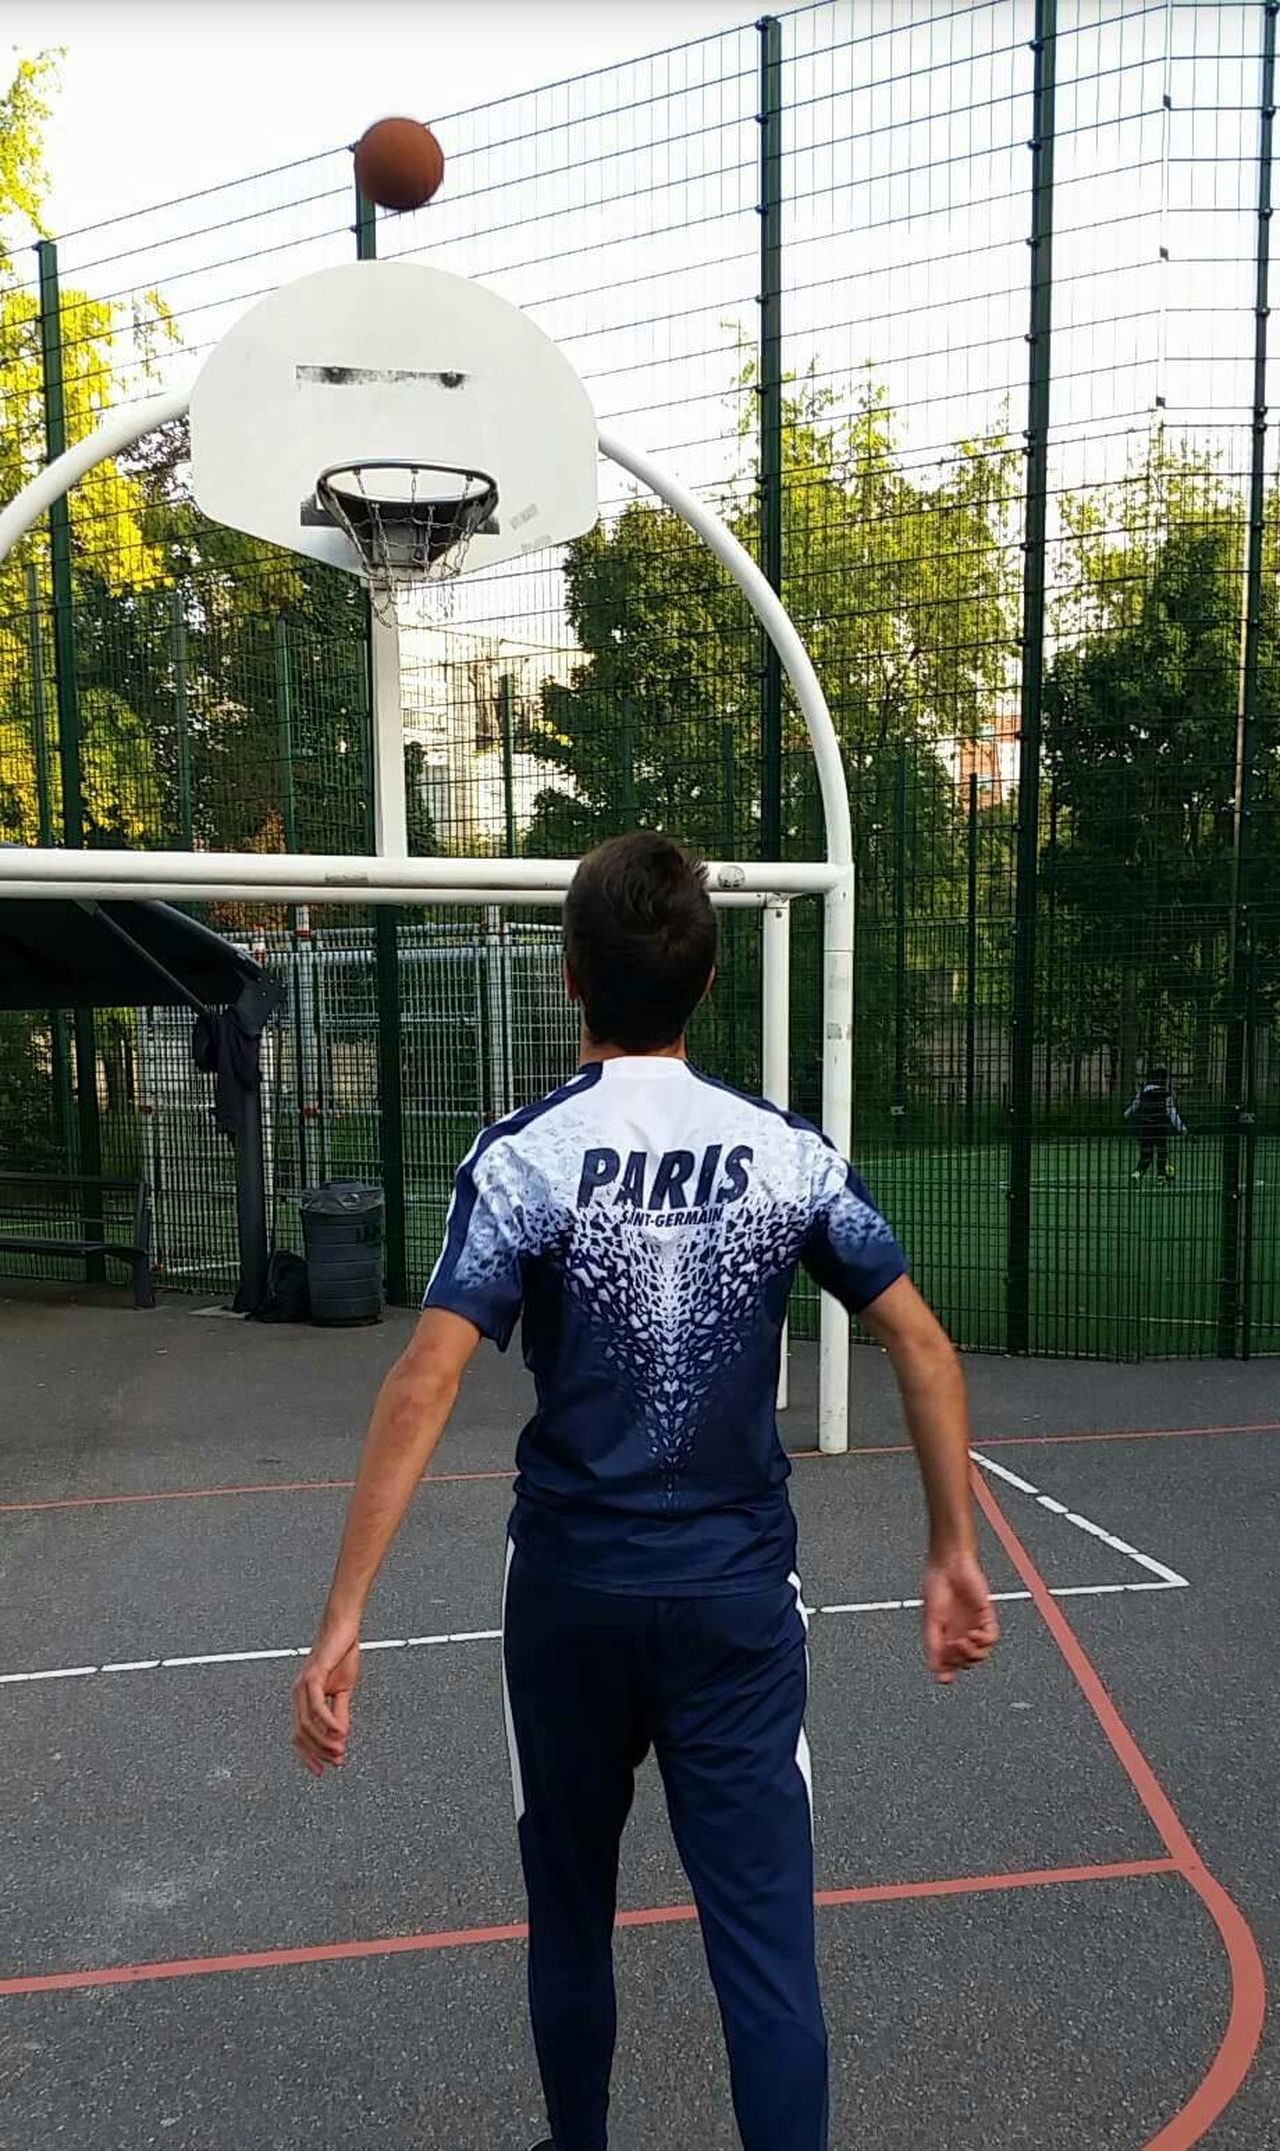 Basketball Paris PSG  Paris Saint Germain Summer City Stade Switch